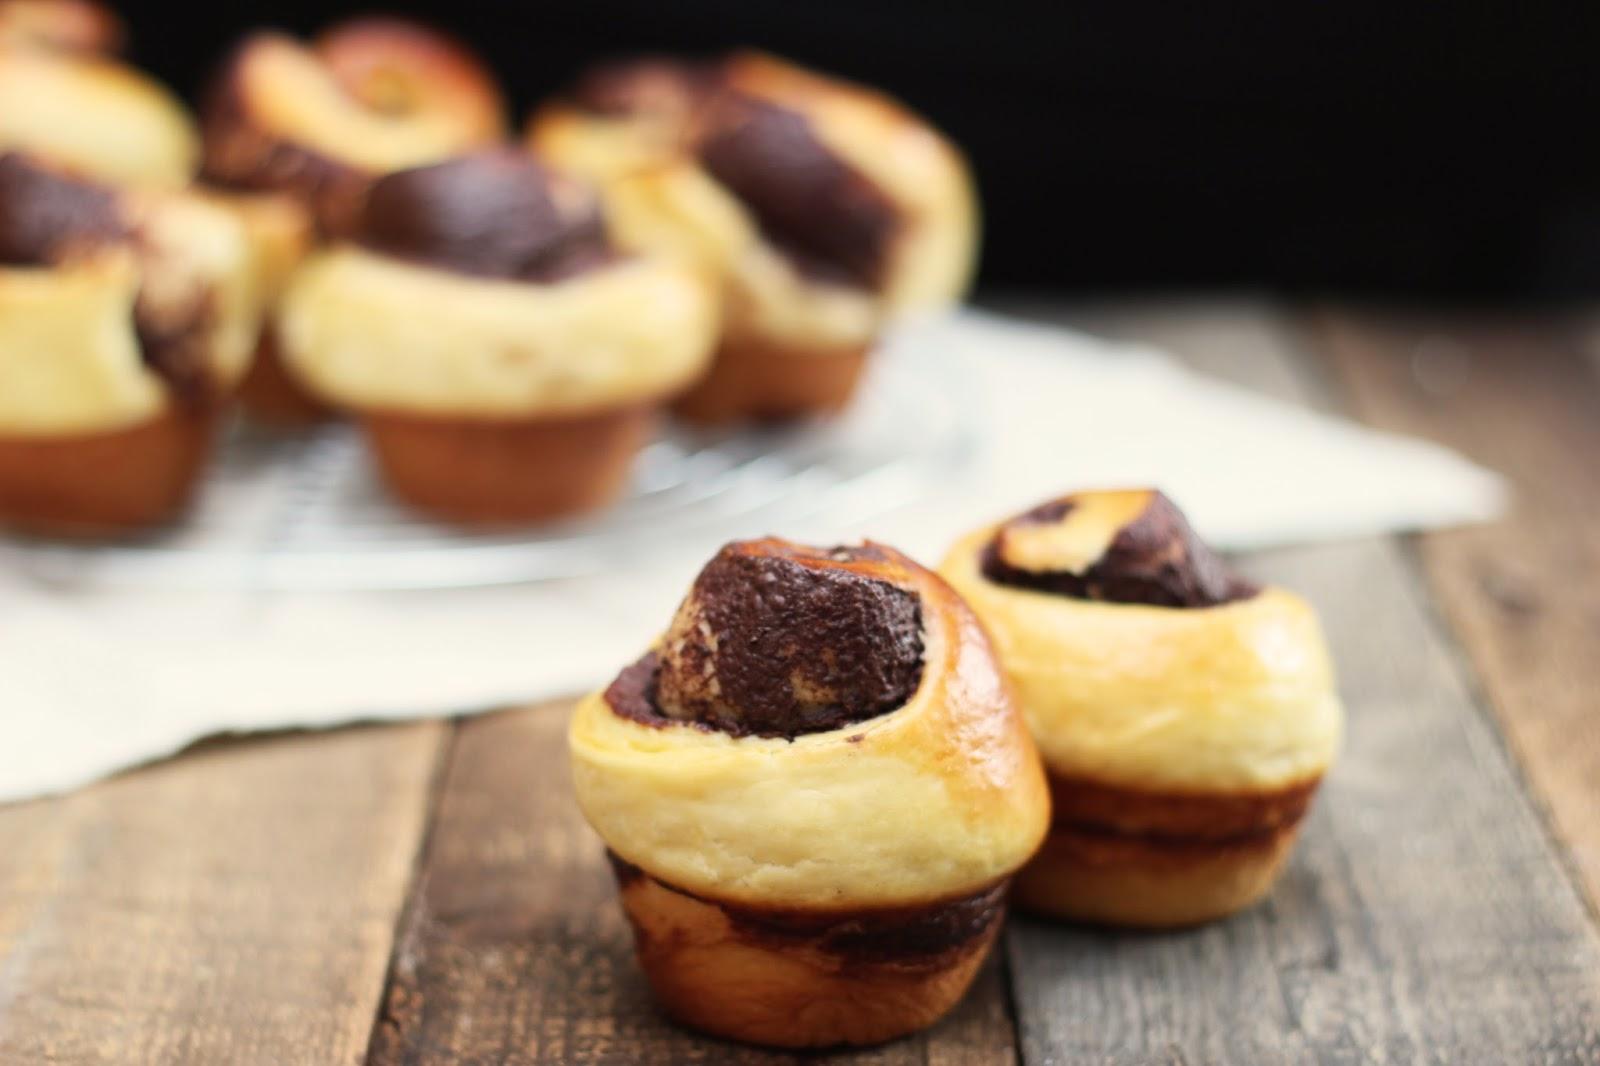 http://carnet-sucre.blogspot.com/2016/03/brioche-au-chocolat.html